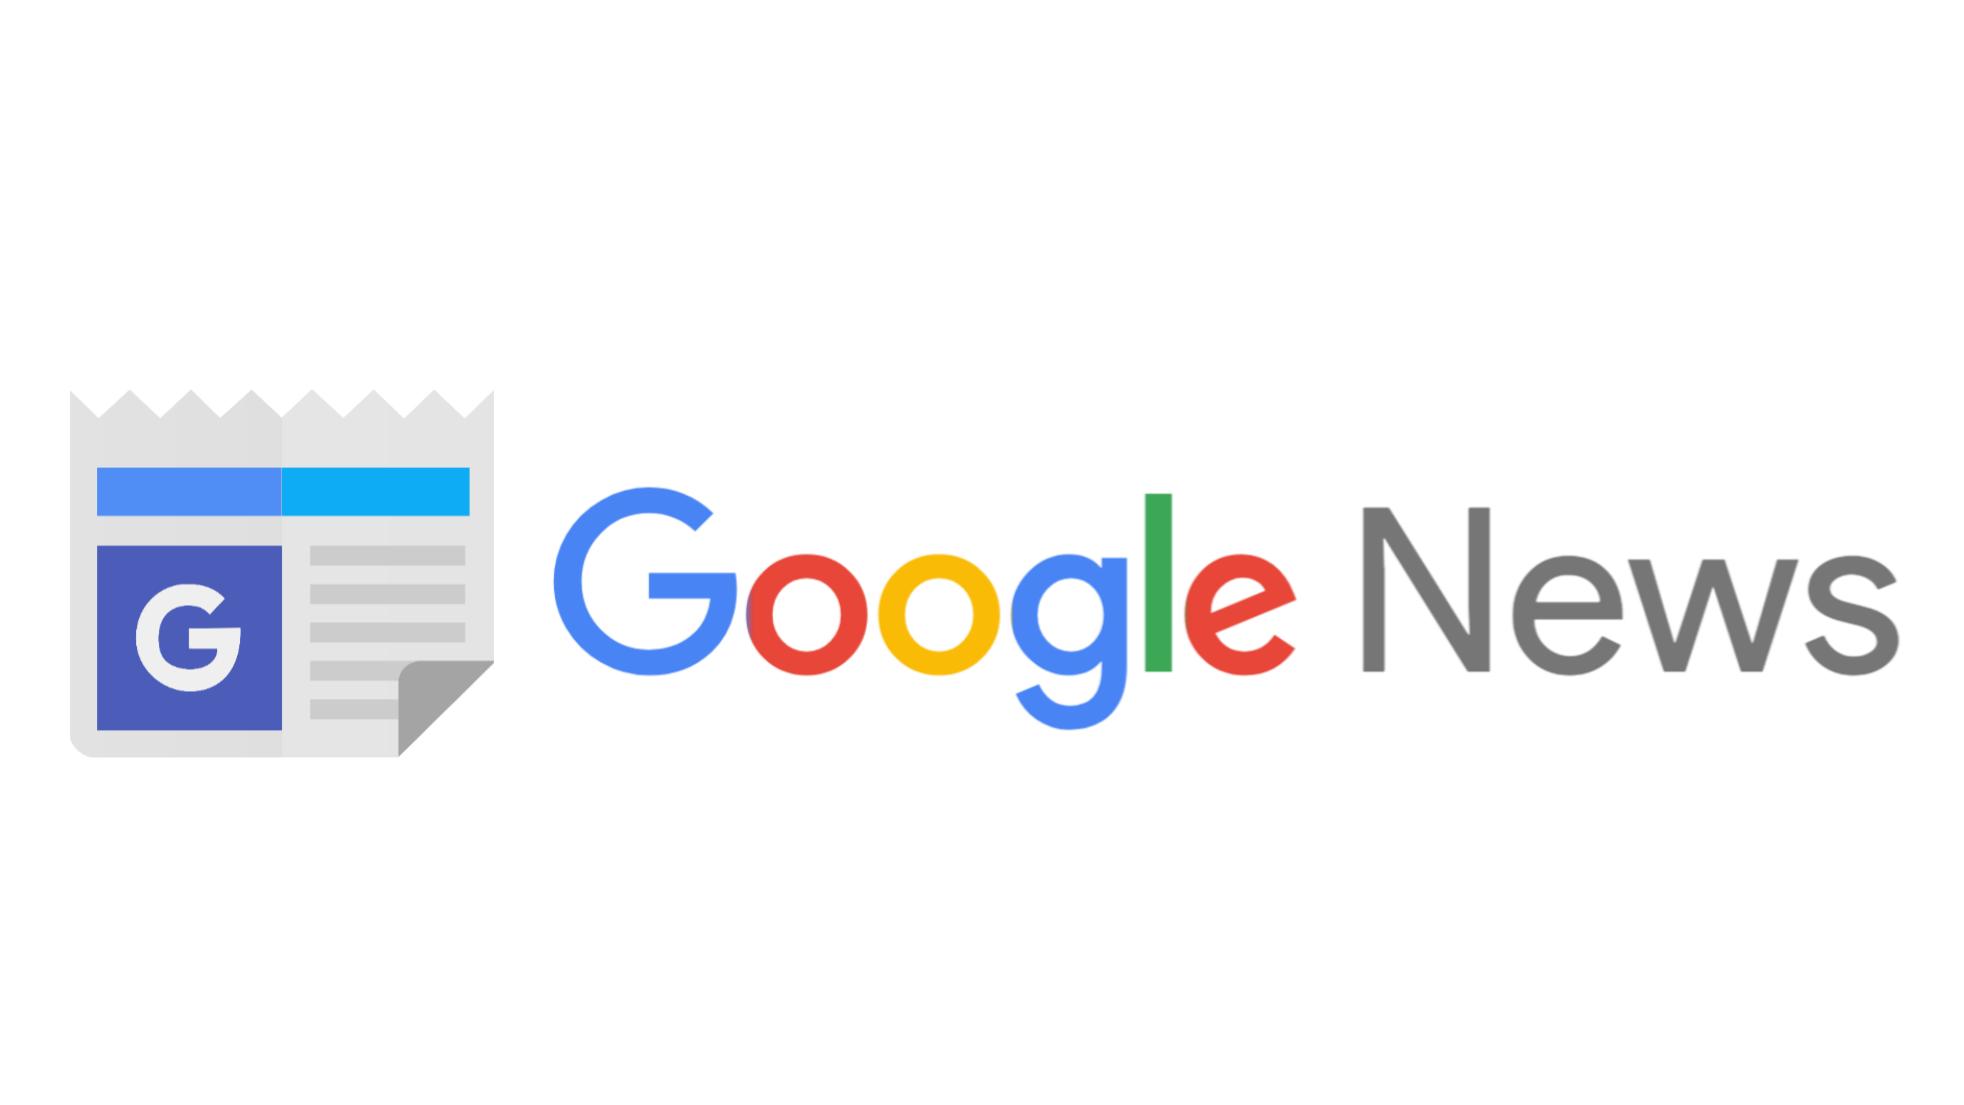 Get 3 Guest posts on 3 google news high traffic websites